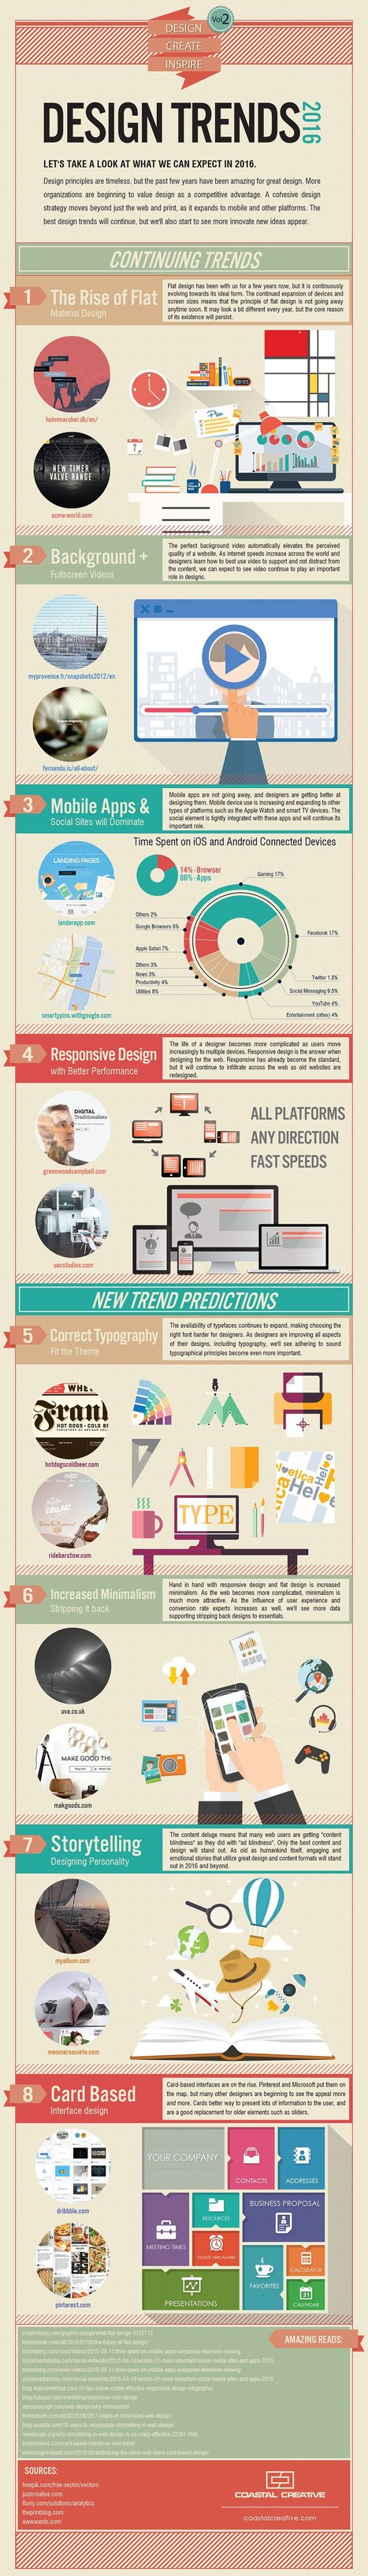 8 Web design trends for 2016 [Infographic] - Smart Insights Digital Marketing Advice | AlexZ | Scoop.it